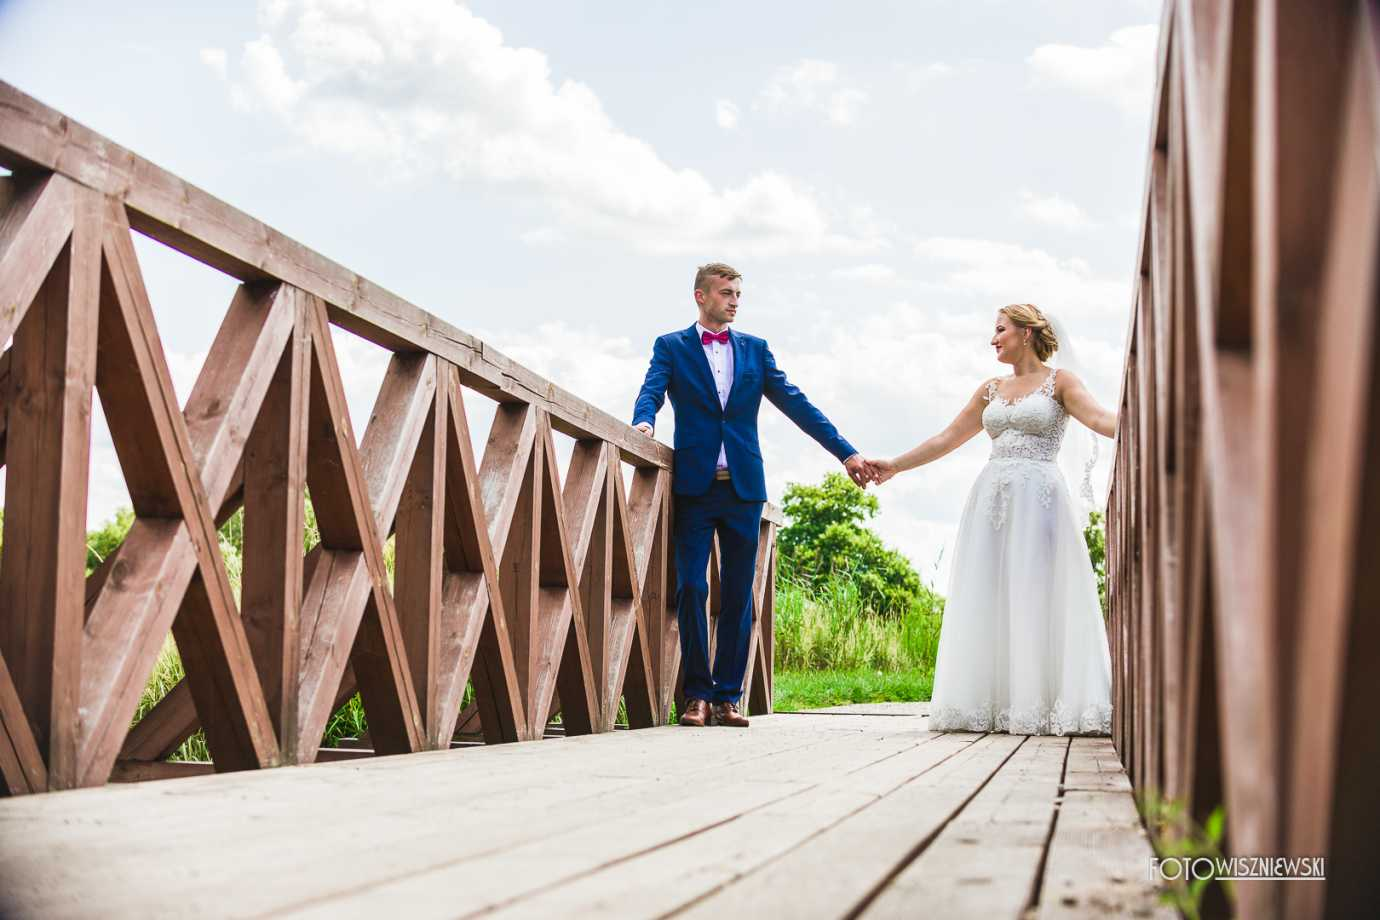 Plener poślubny